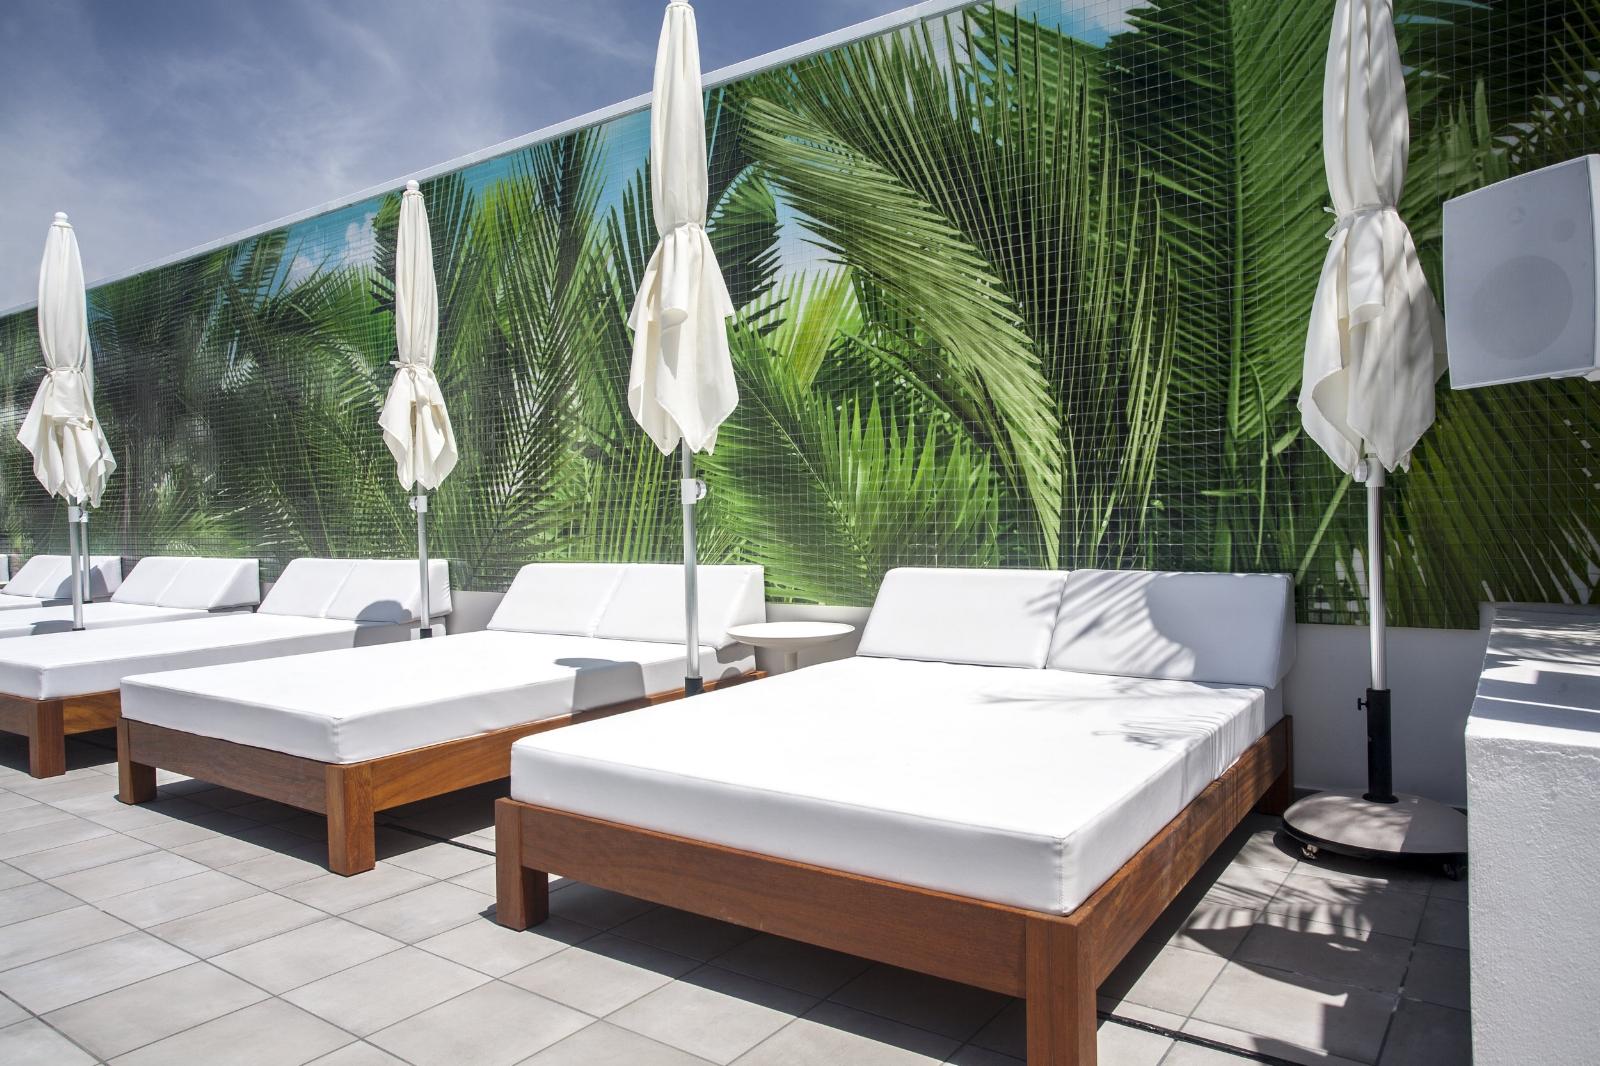 Mural for   Vanilla Garden   4* Hotel Boutique - Tenerife